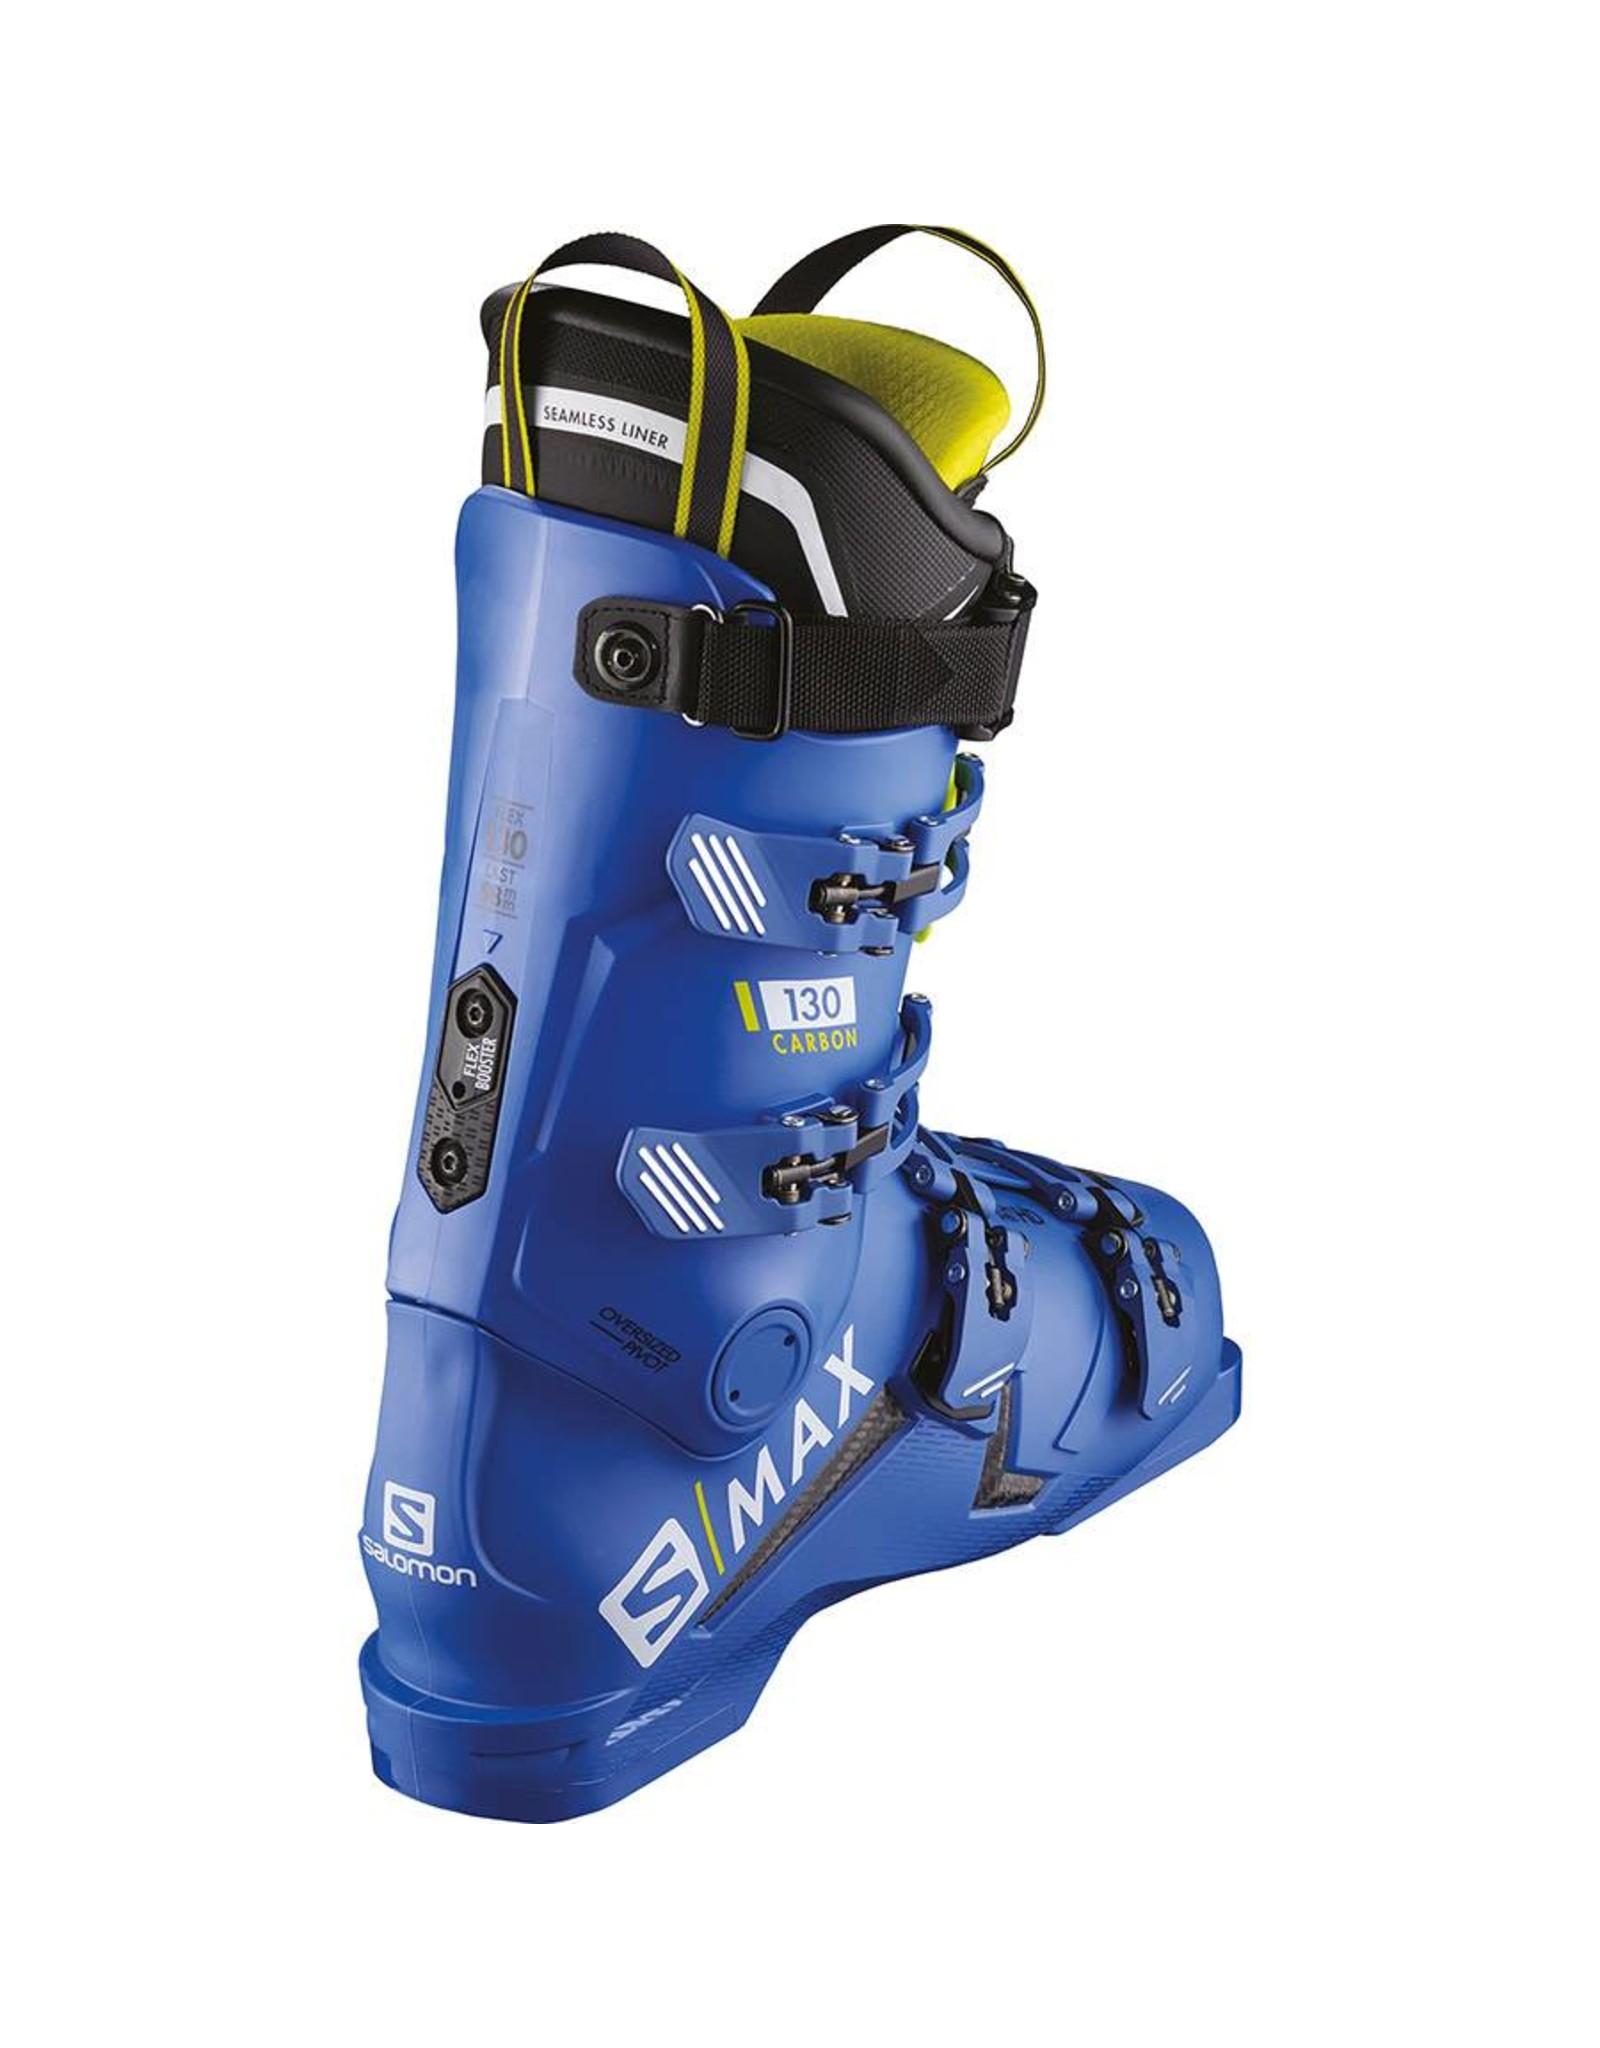 Salomon Salomon S/MAX 130 Carbon Men's Boot